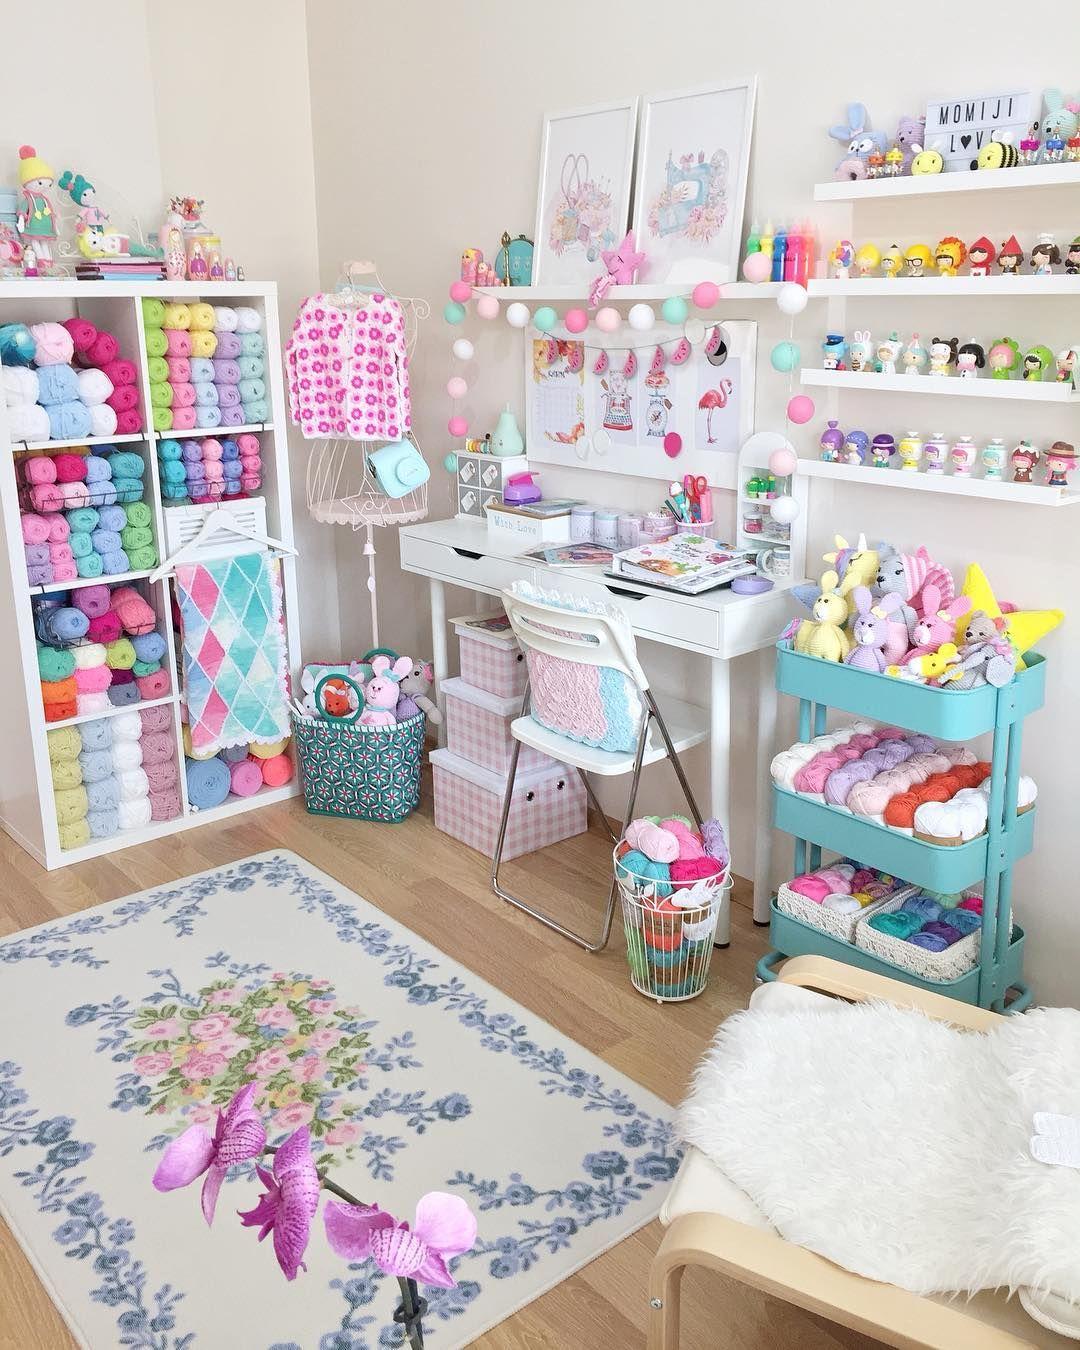 10x10 Room Layout Craft: Cute Craft Space - @aycrk On Instagram